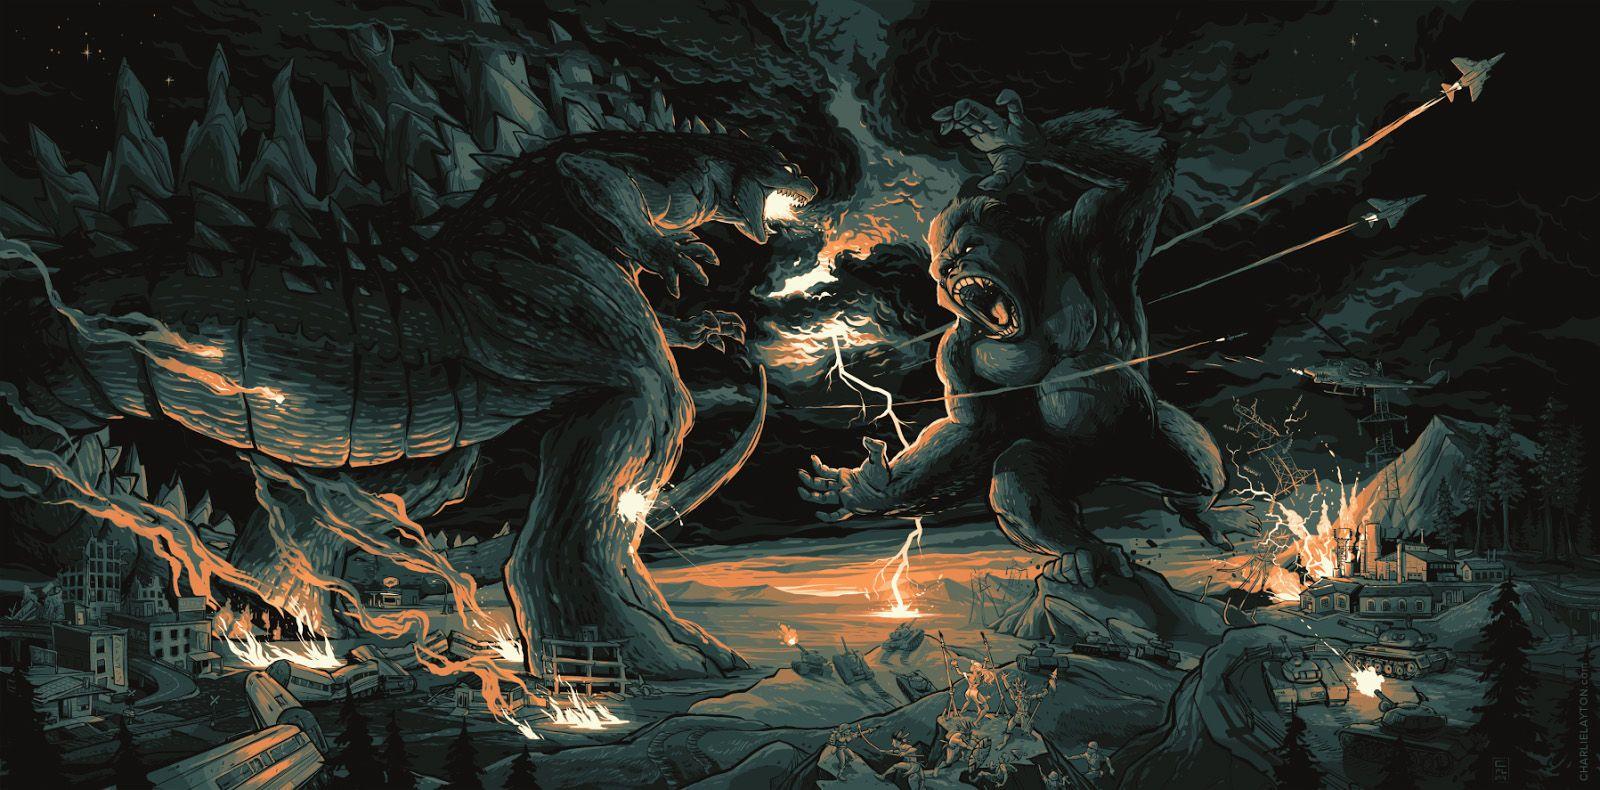 Godzilla vs Kong Will Be a 'Dark' Movie | ScreenRant